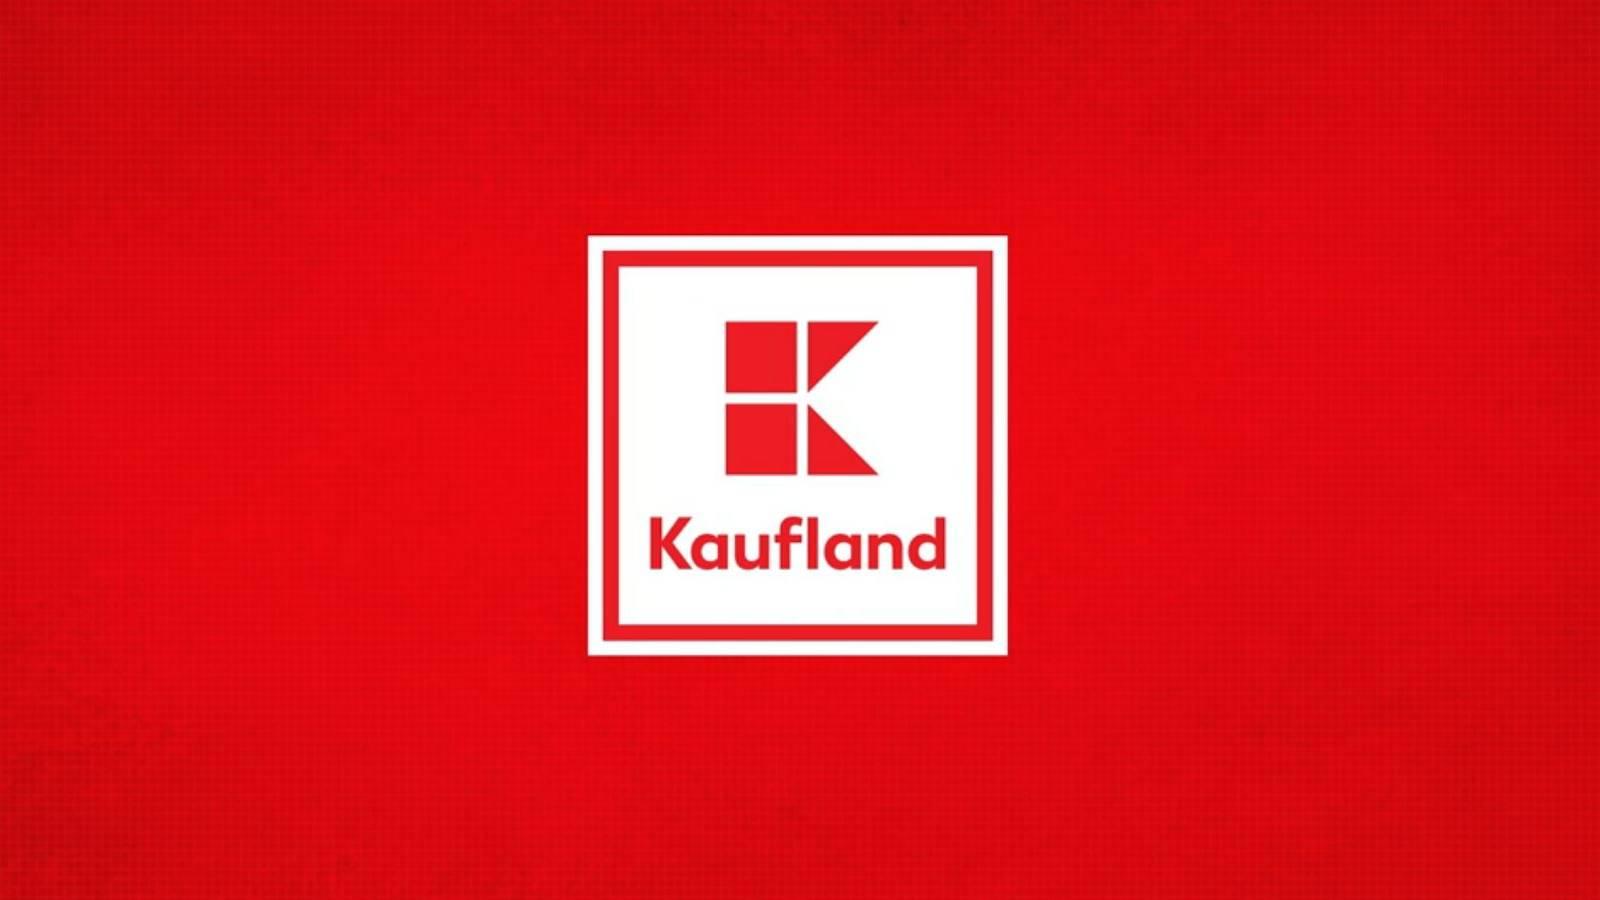 Kaufland cantitate